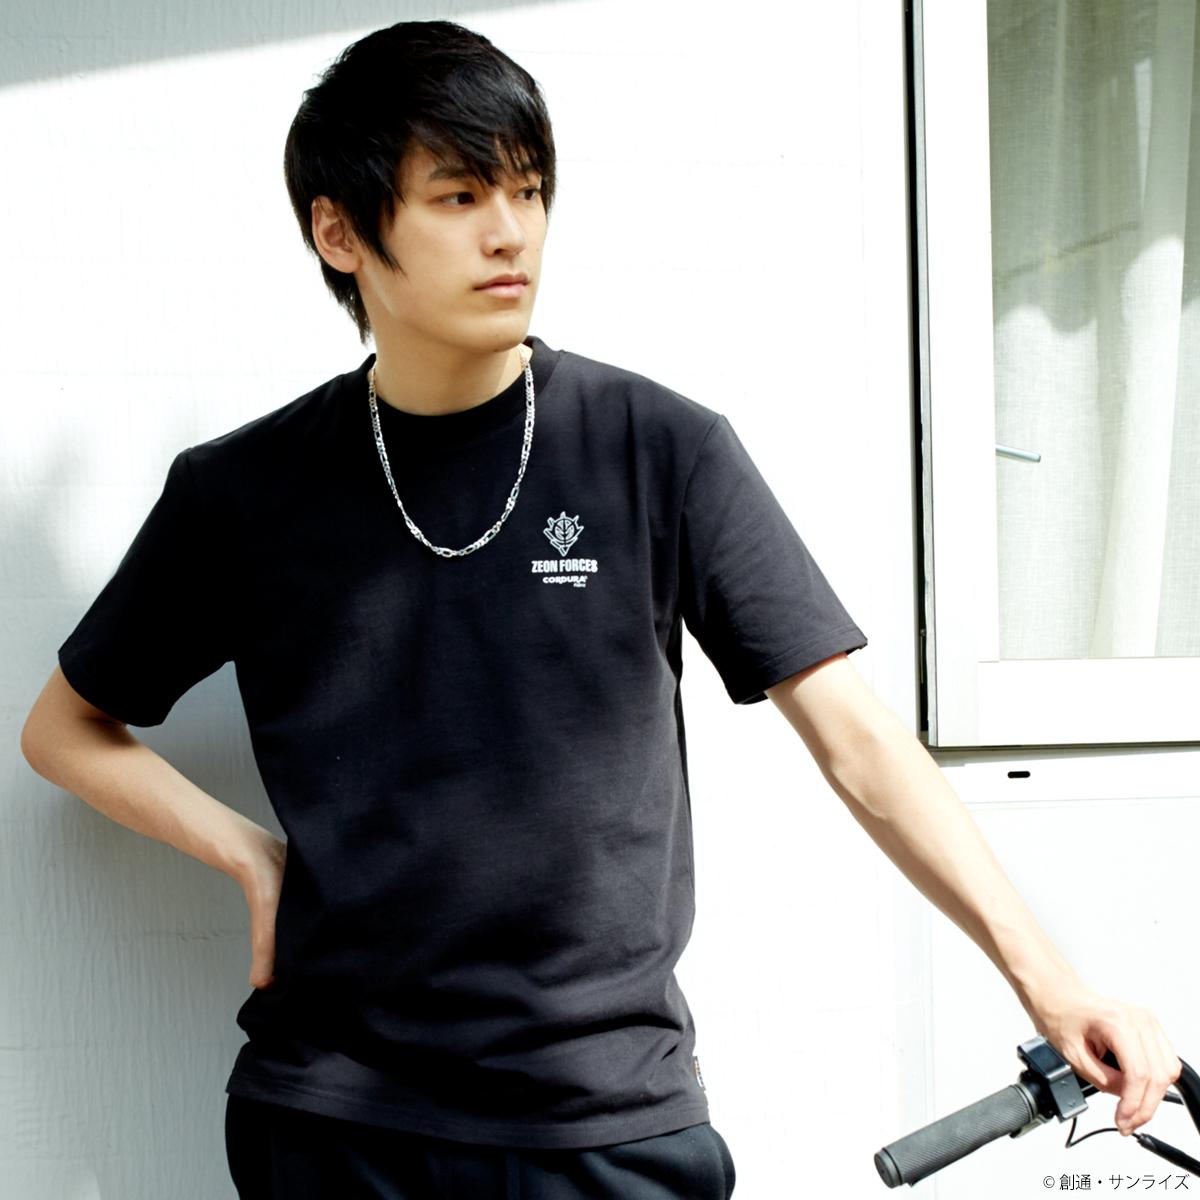 STRICT-G FAB『機動戦士ガンダム』CORDURA  Tシャツ ZEON